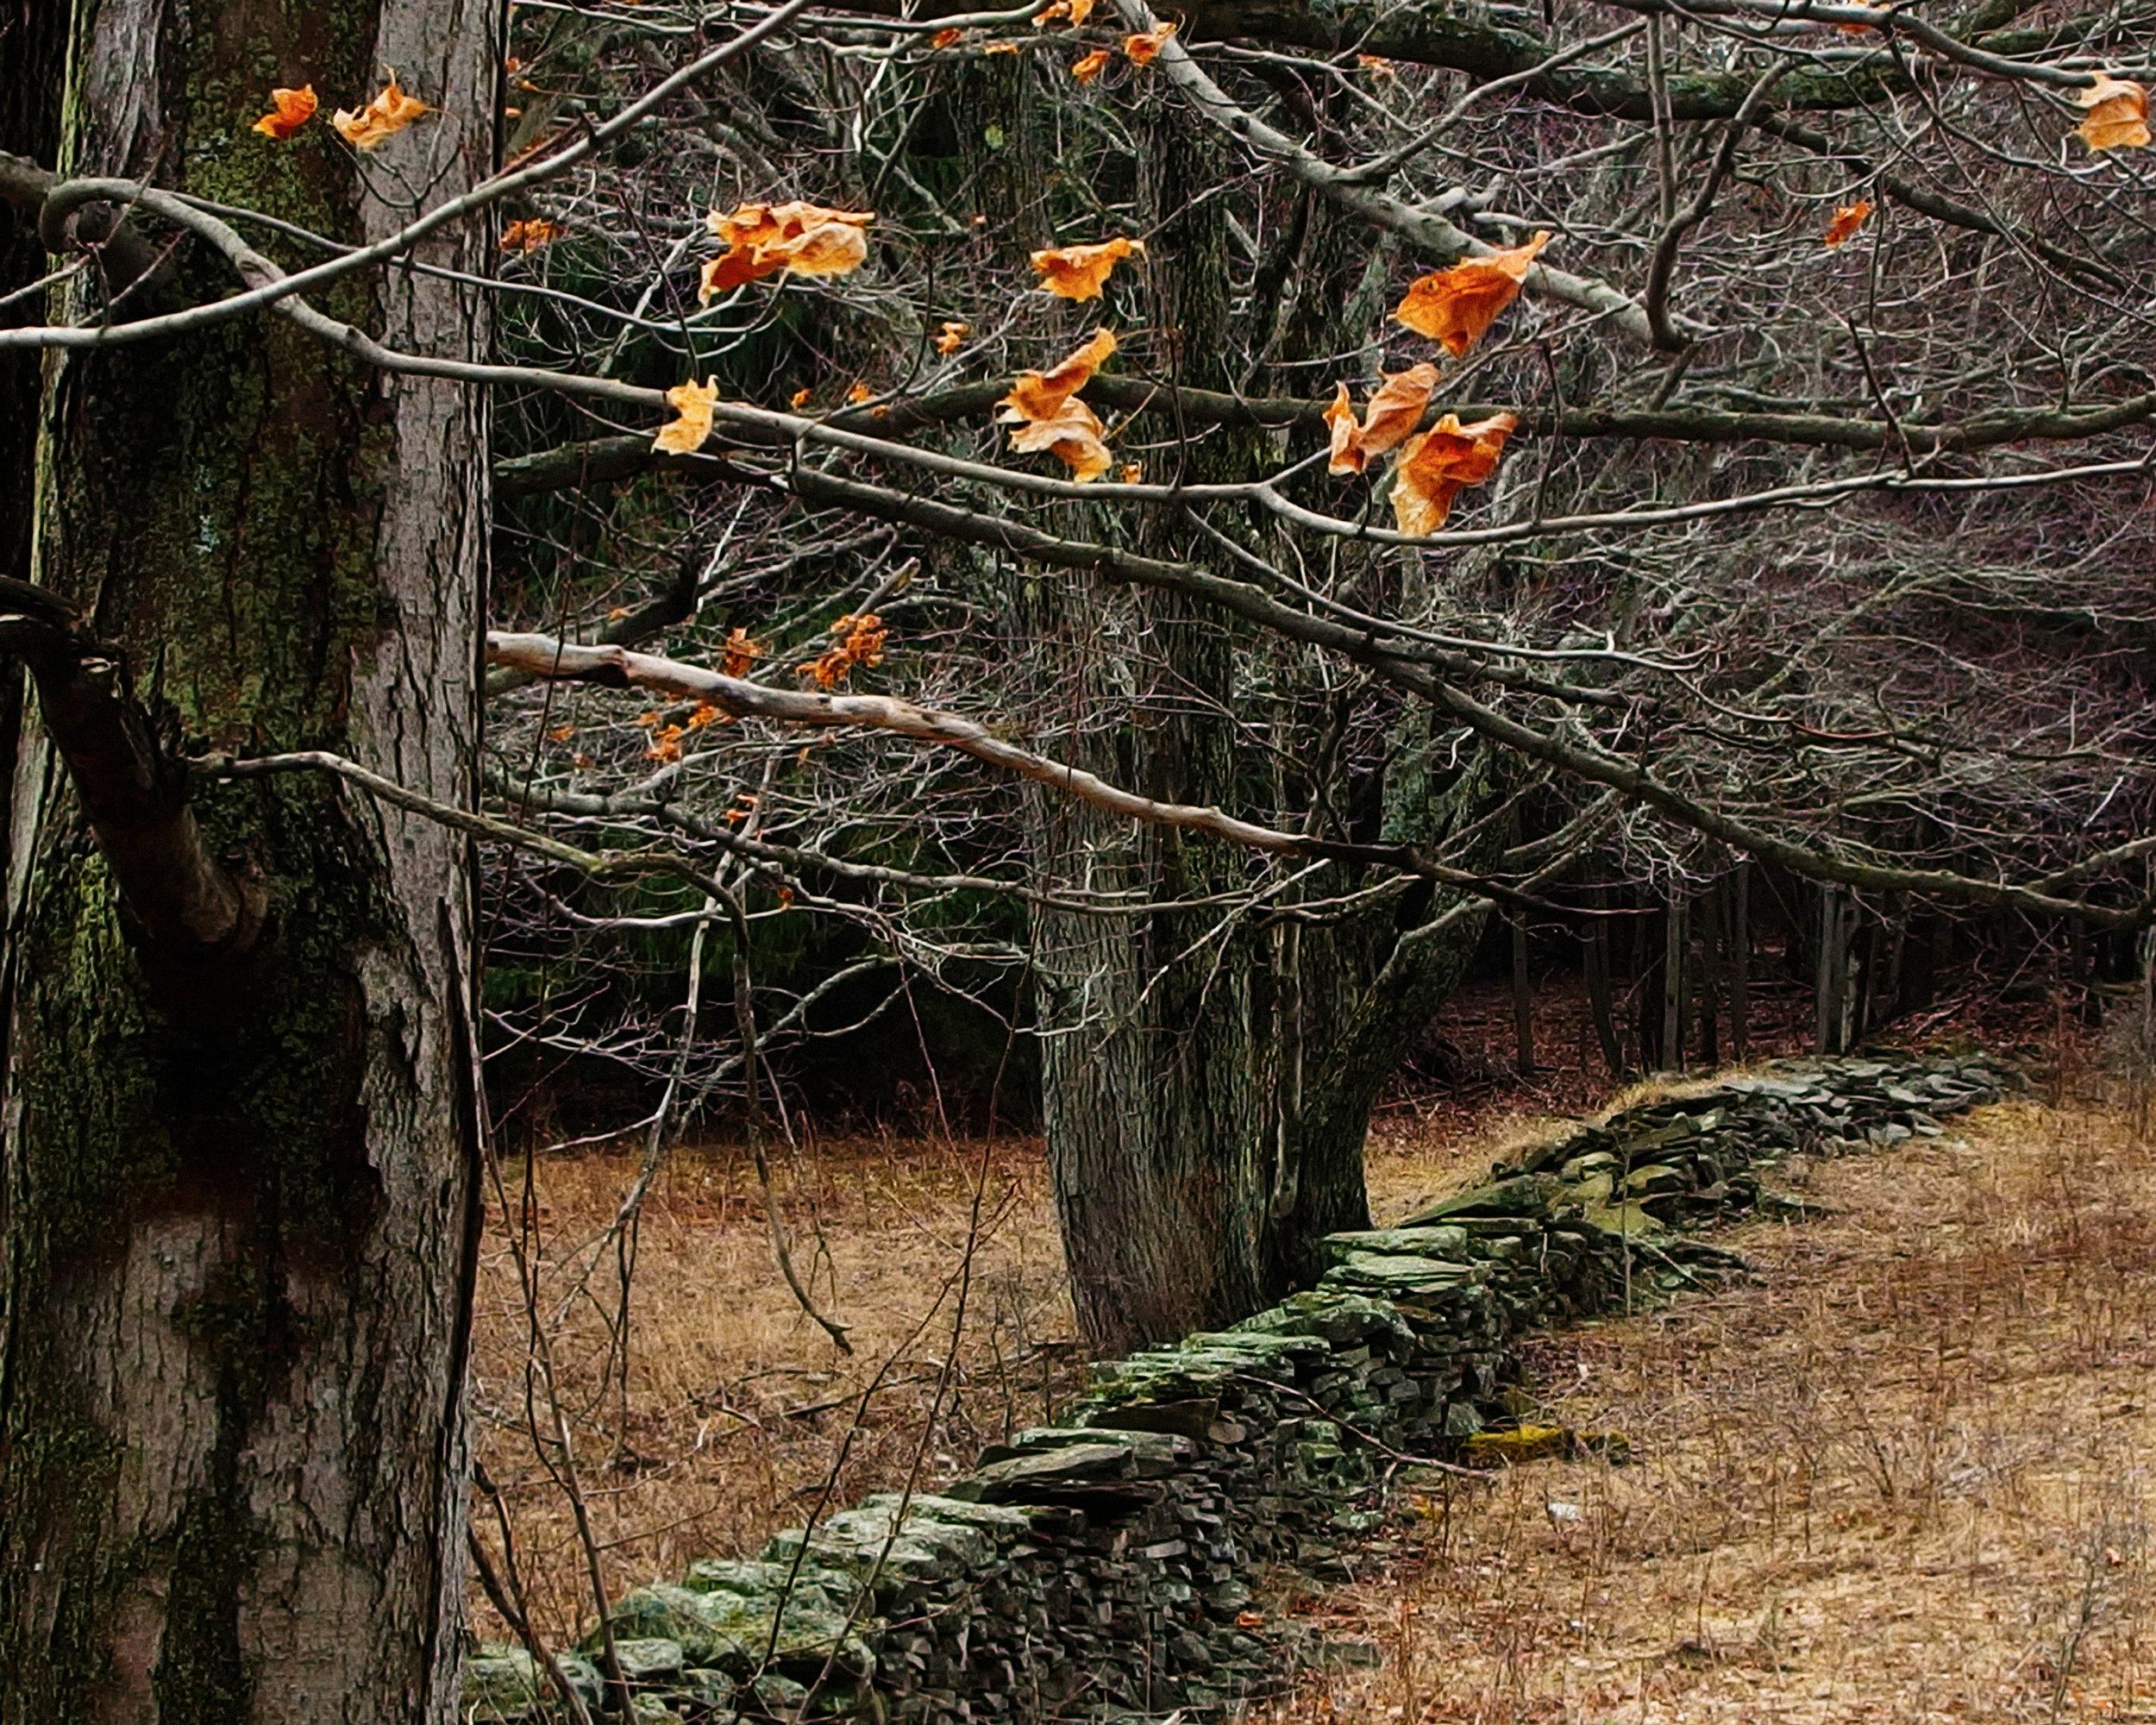 """Stone Wall"" Linda Austin"